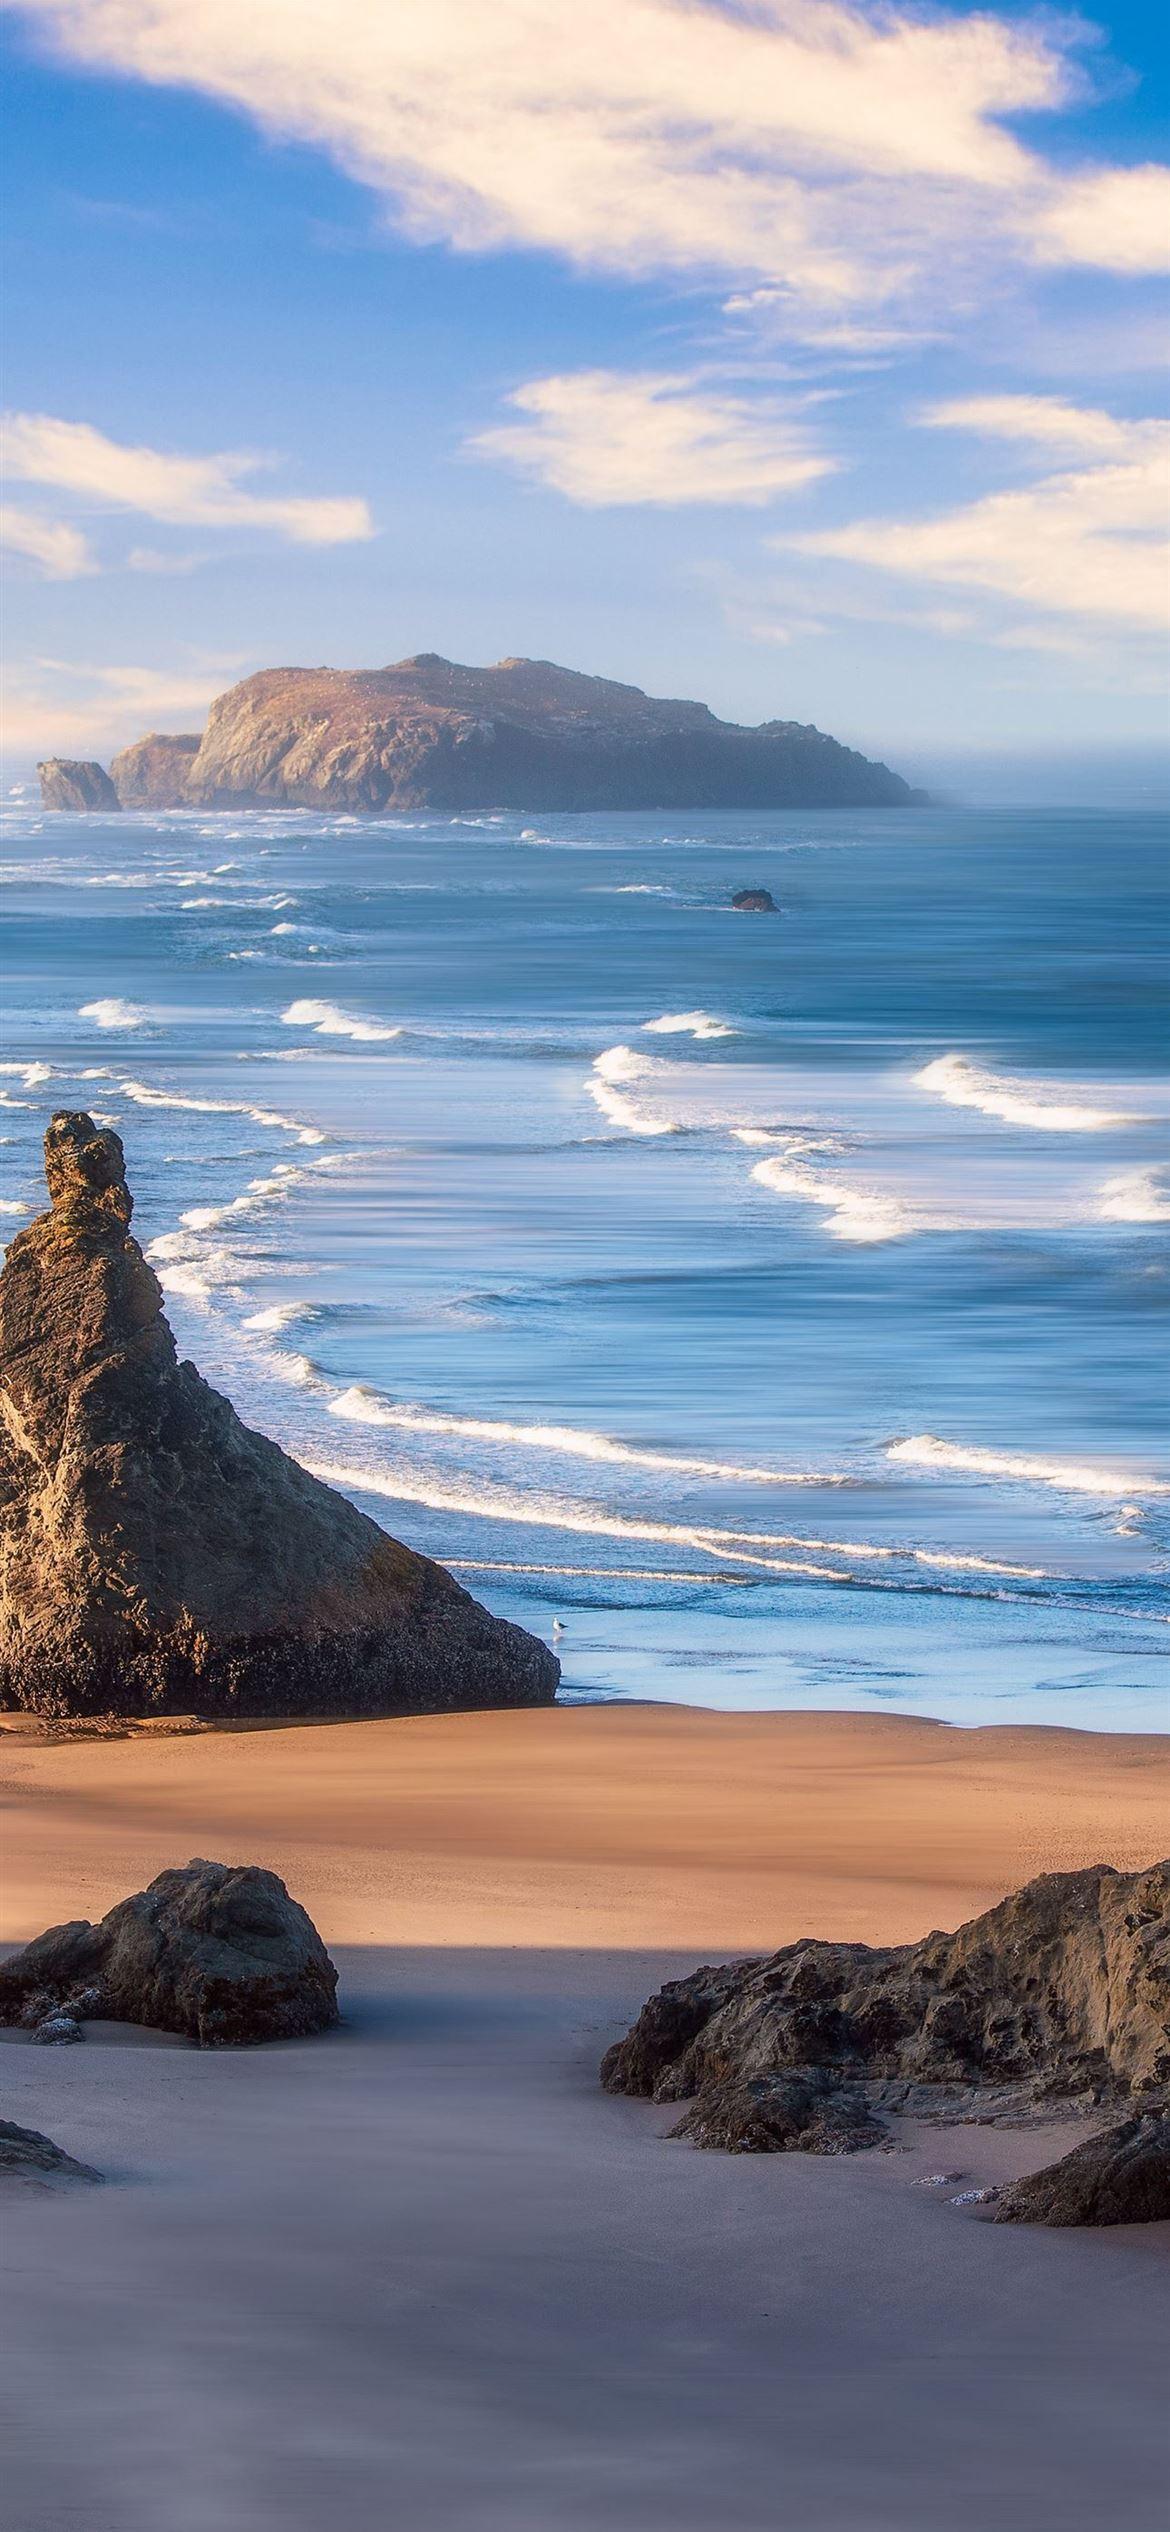 oregon coast 5k iPhone 12 Wallpapers Free Download